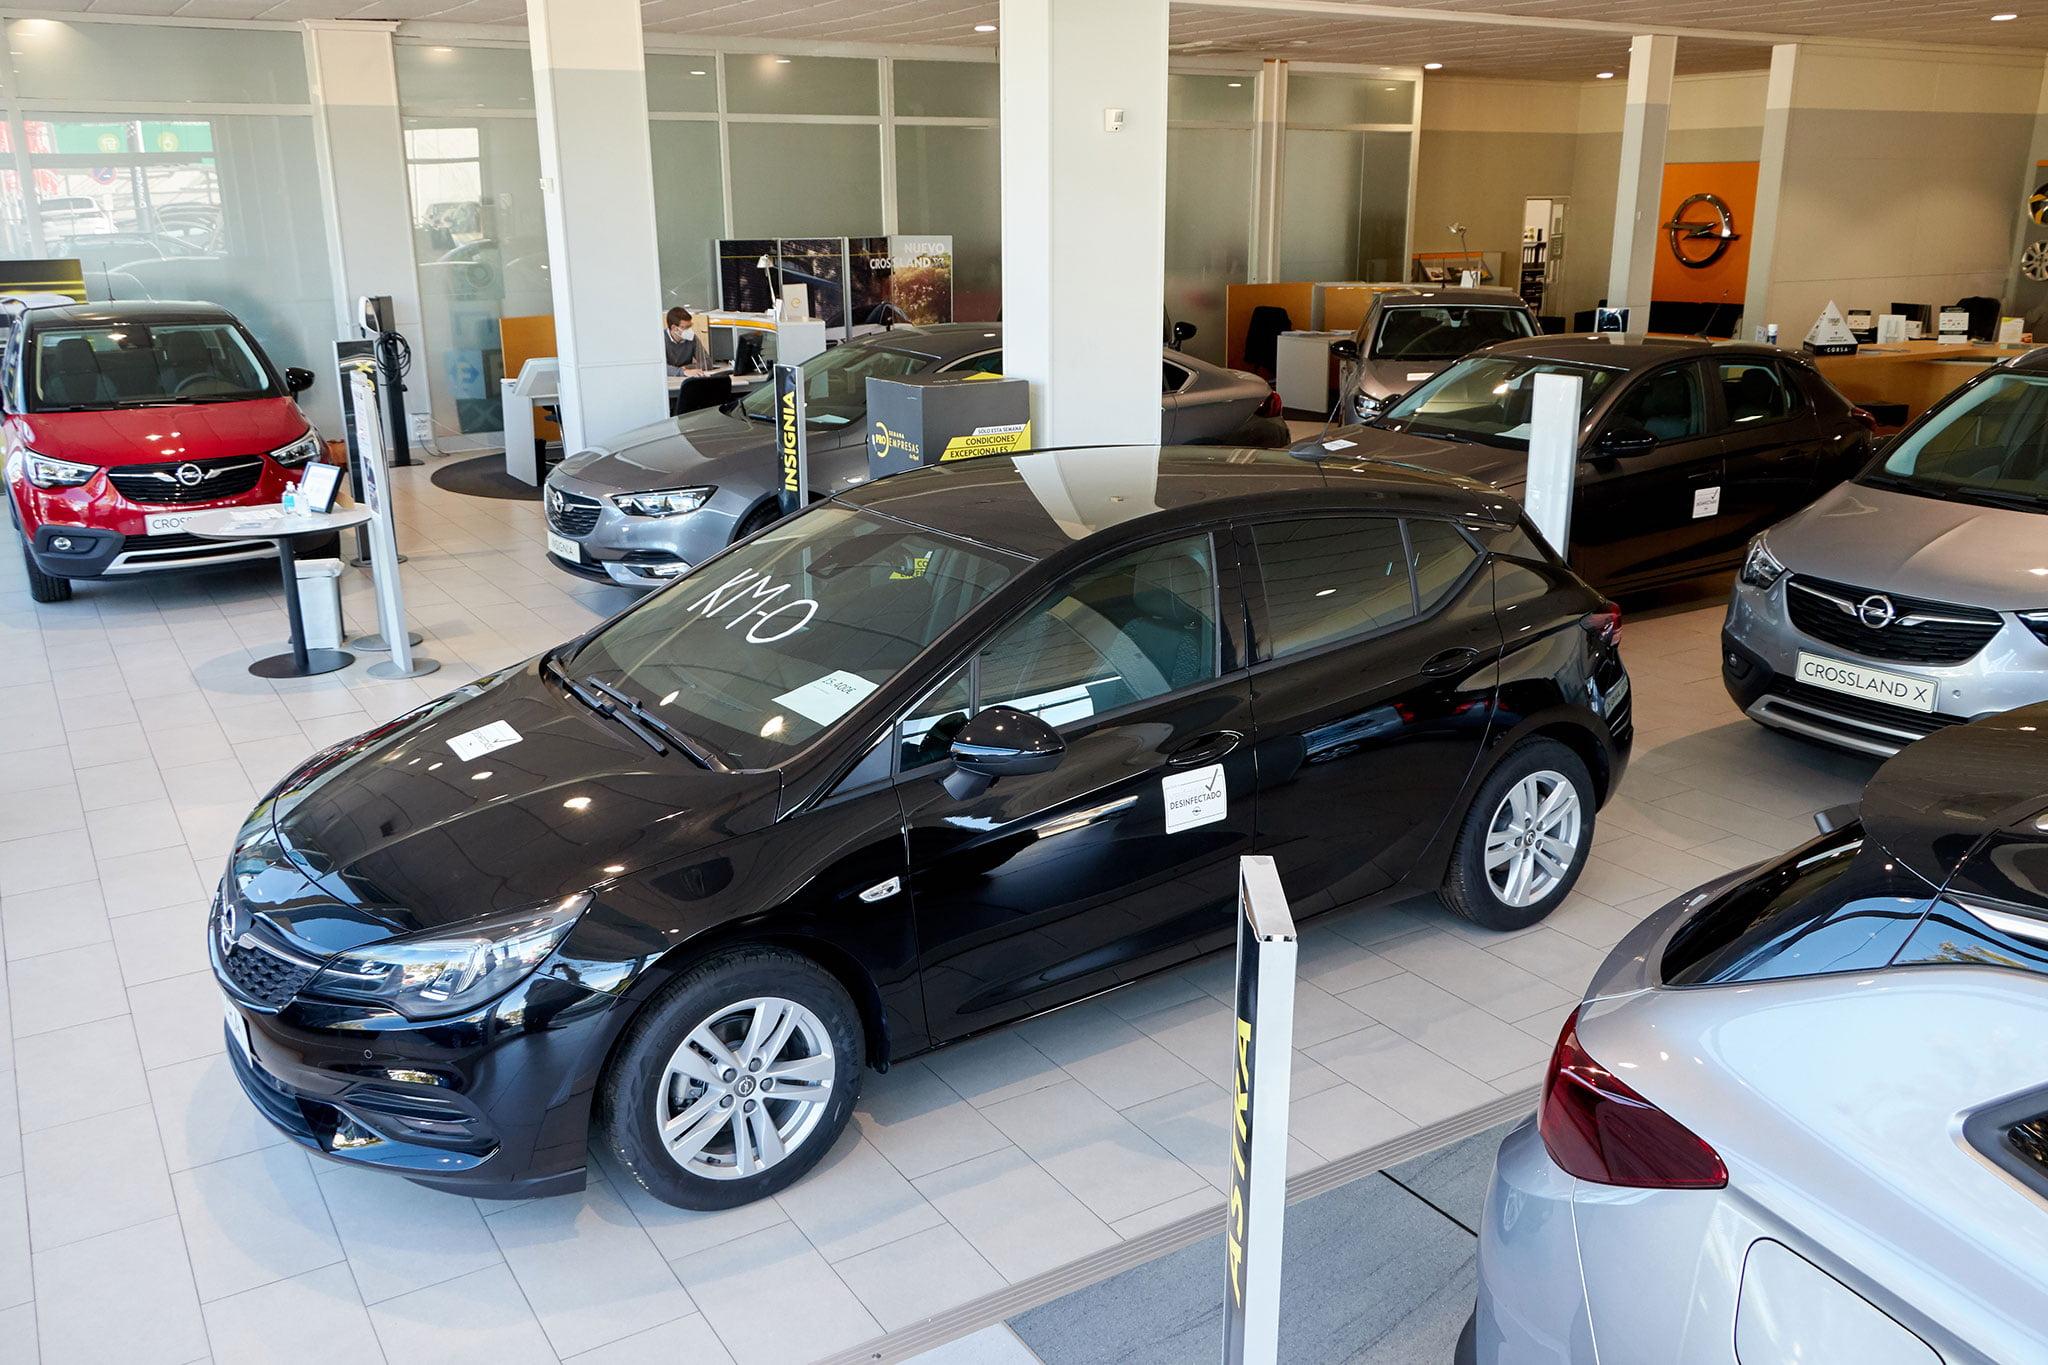 Vehículos kilómetro 0 en Dénia – Auto Dénia Motors